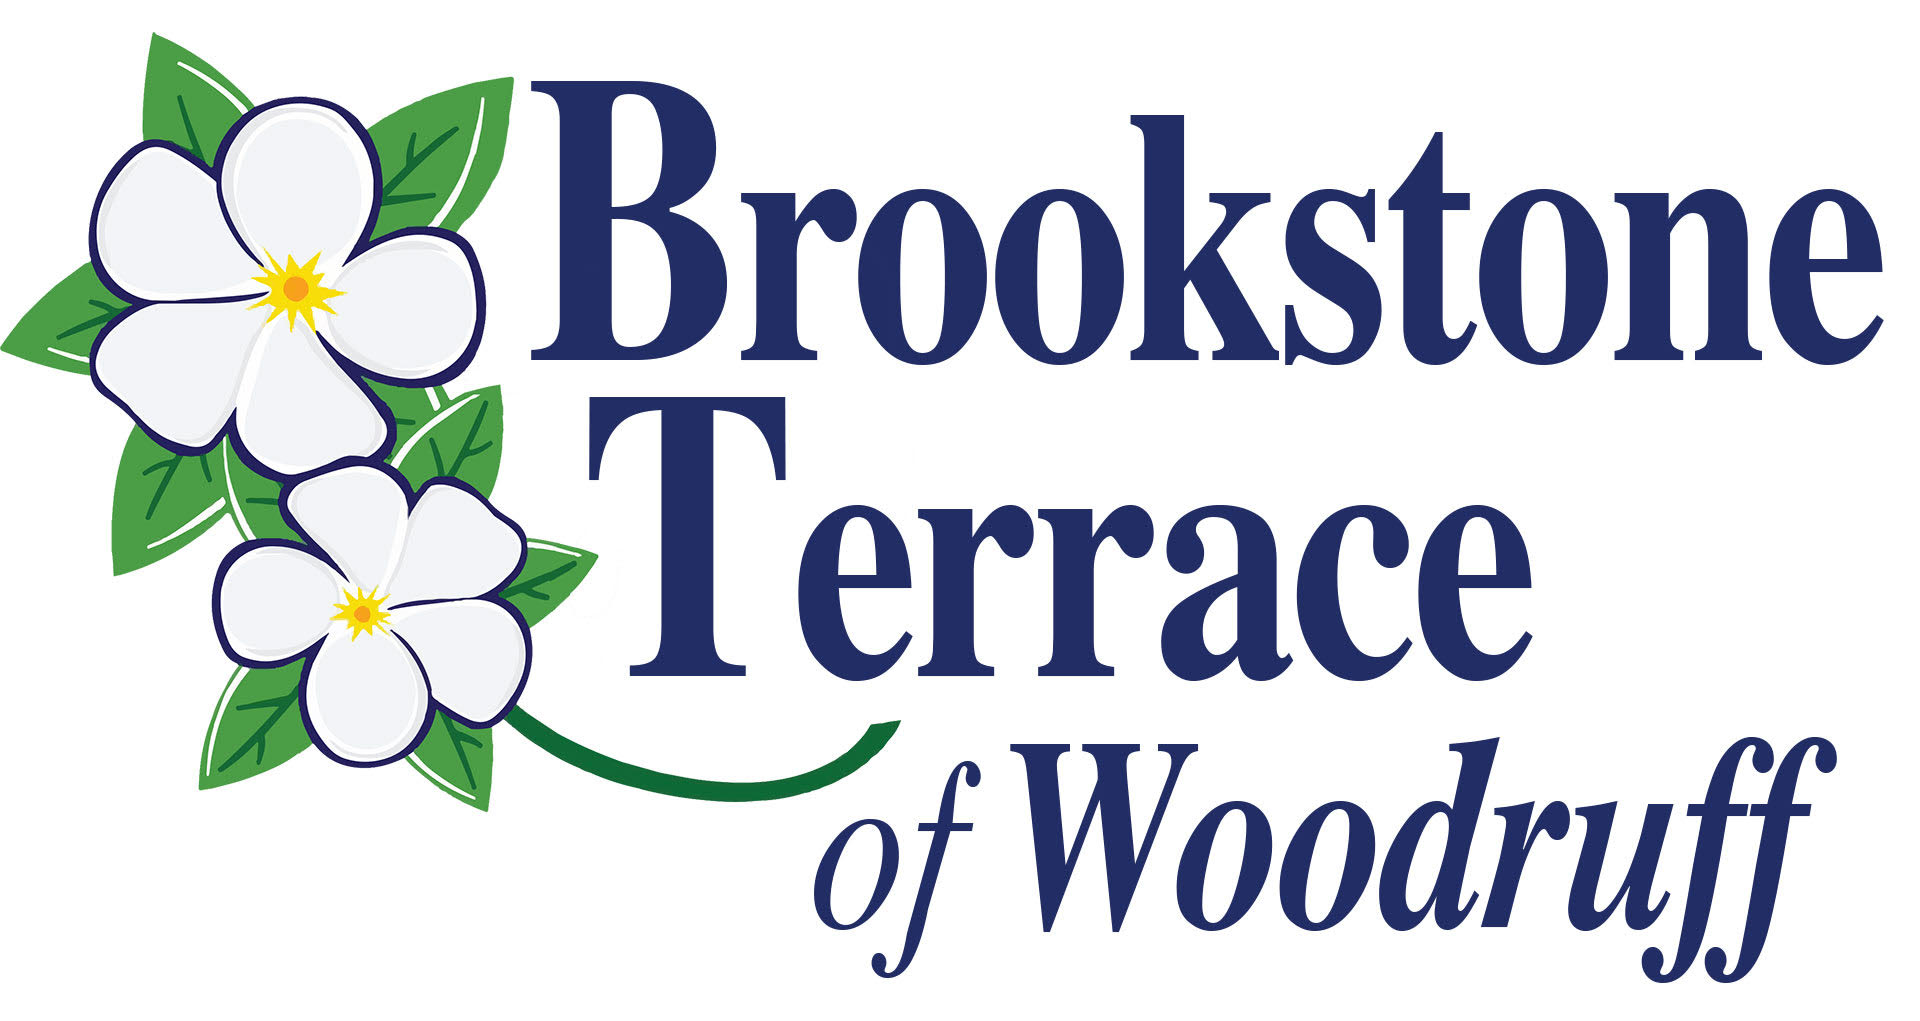 Alzheimer's Walk to Remember in Woodruff